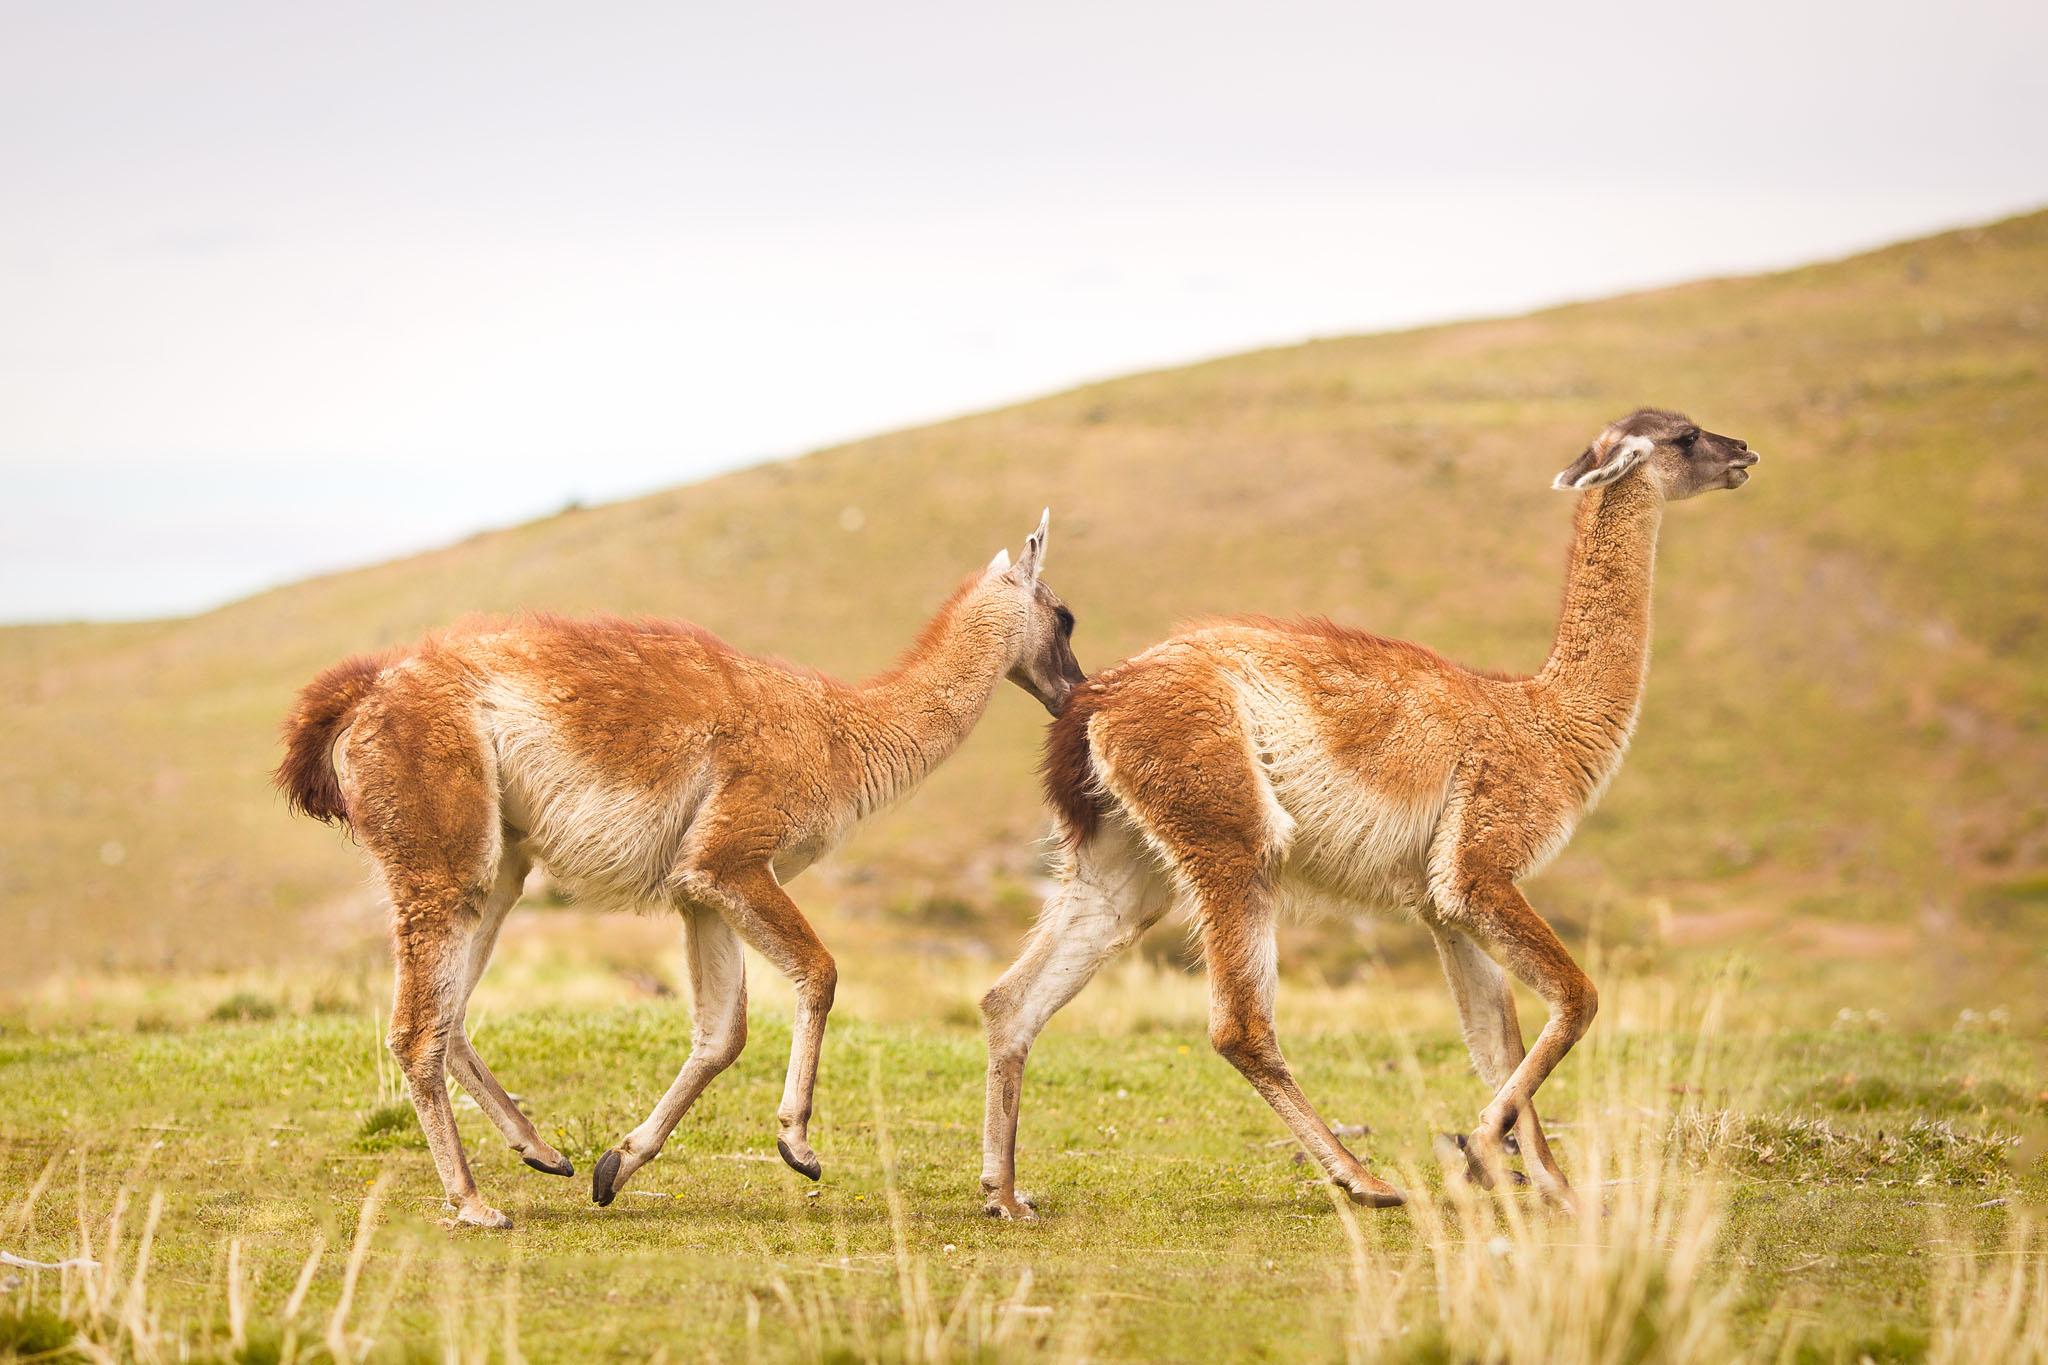 Wedding-Travellers-Overlanding-Destination-Wedding-Chile-Torres-del-Paine-guanaco-lama-llama-tres-torres-funny